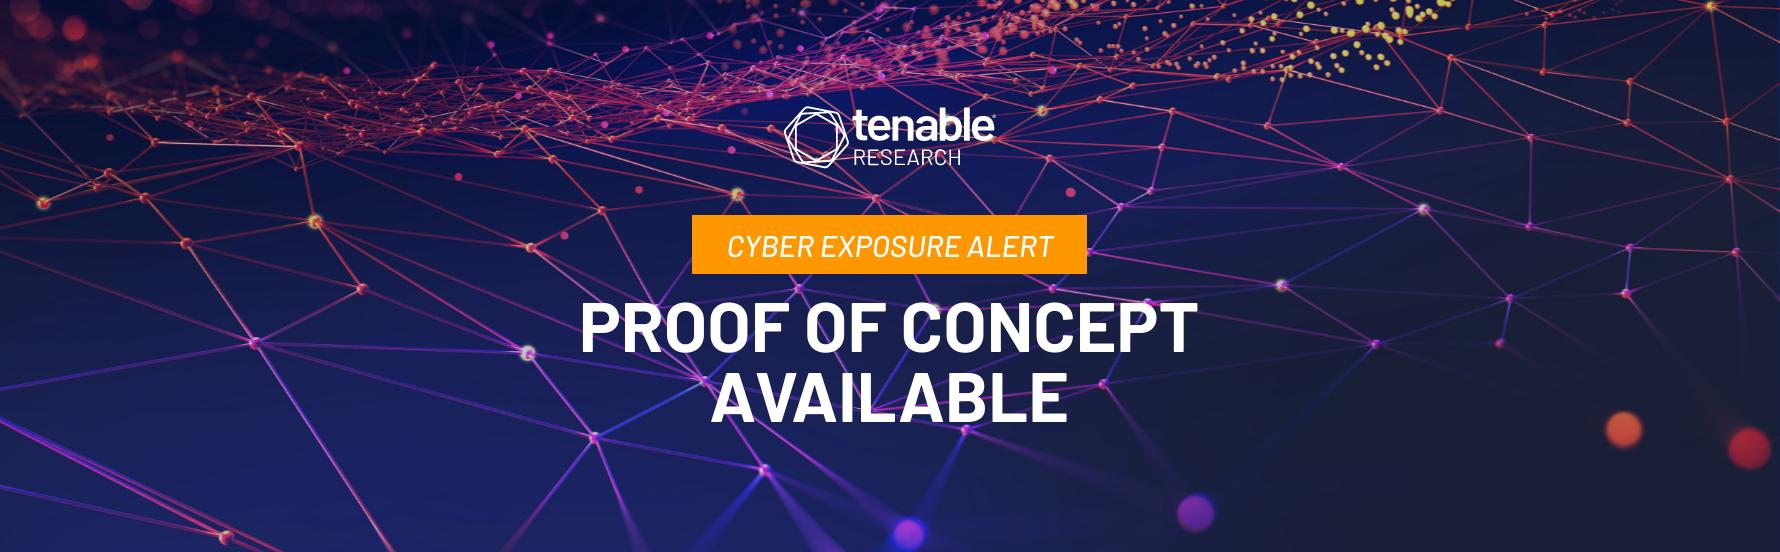 CVE-2021-1675: Proof-of-Concept Leaked for Critical Windows Print Spooler Vulnerability